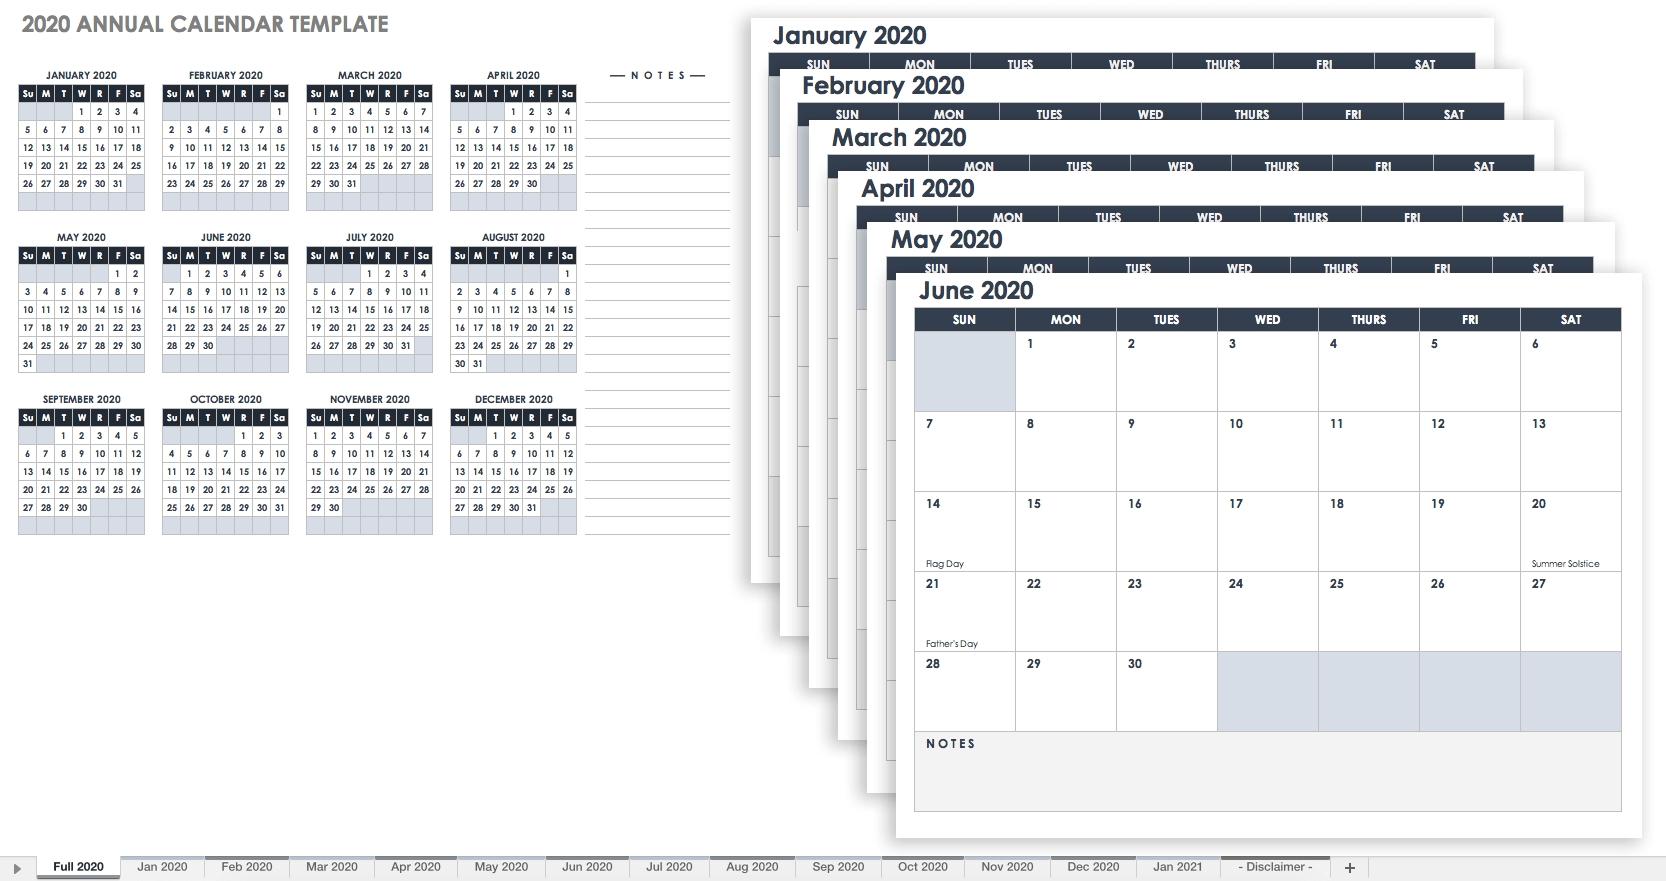 Free Excel Calendar Templates inside Excel Calendar At A Glance 2020